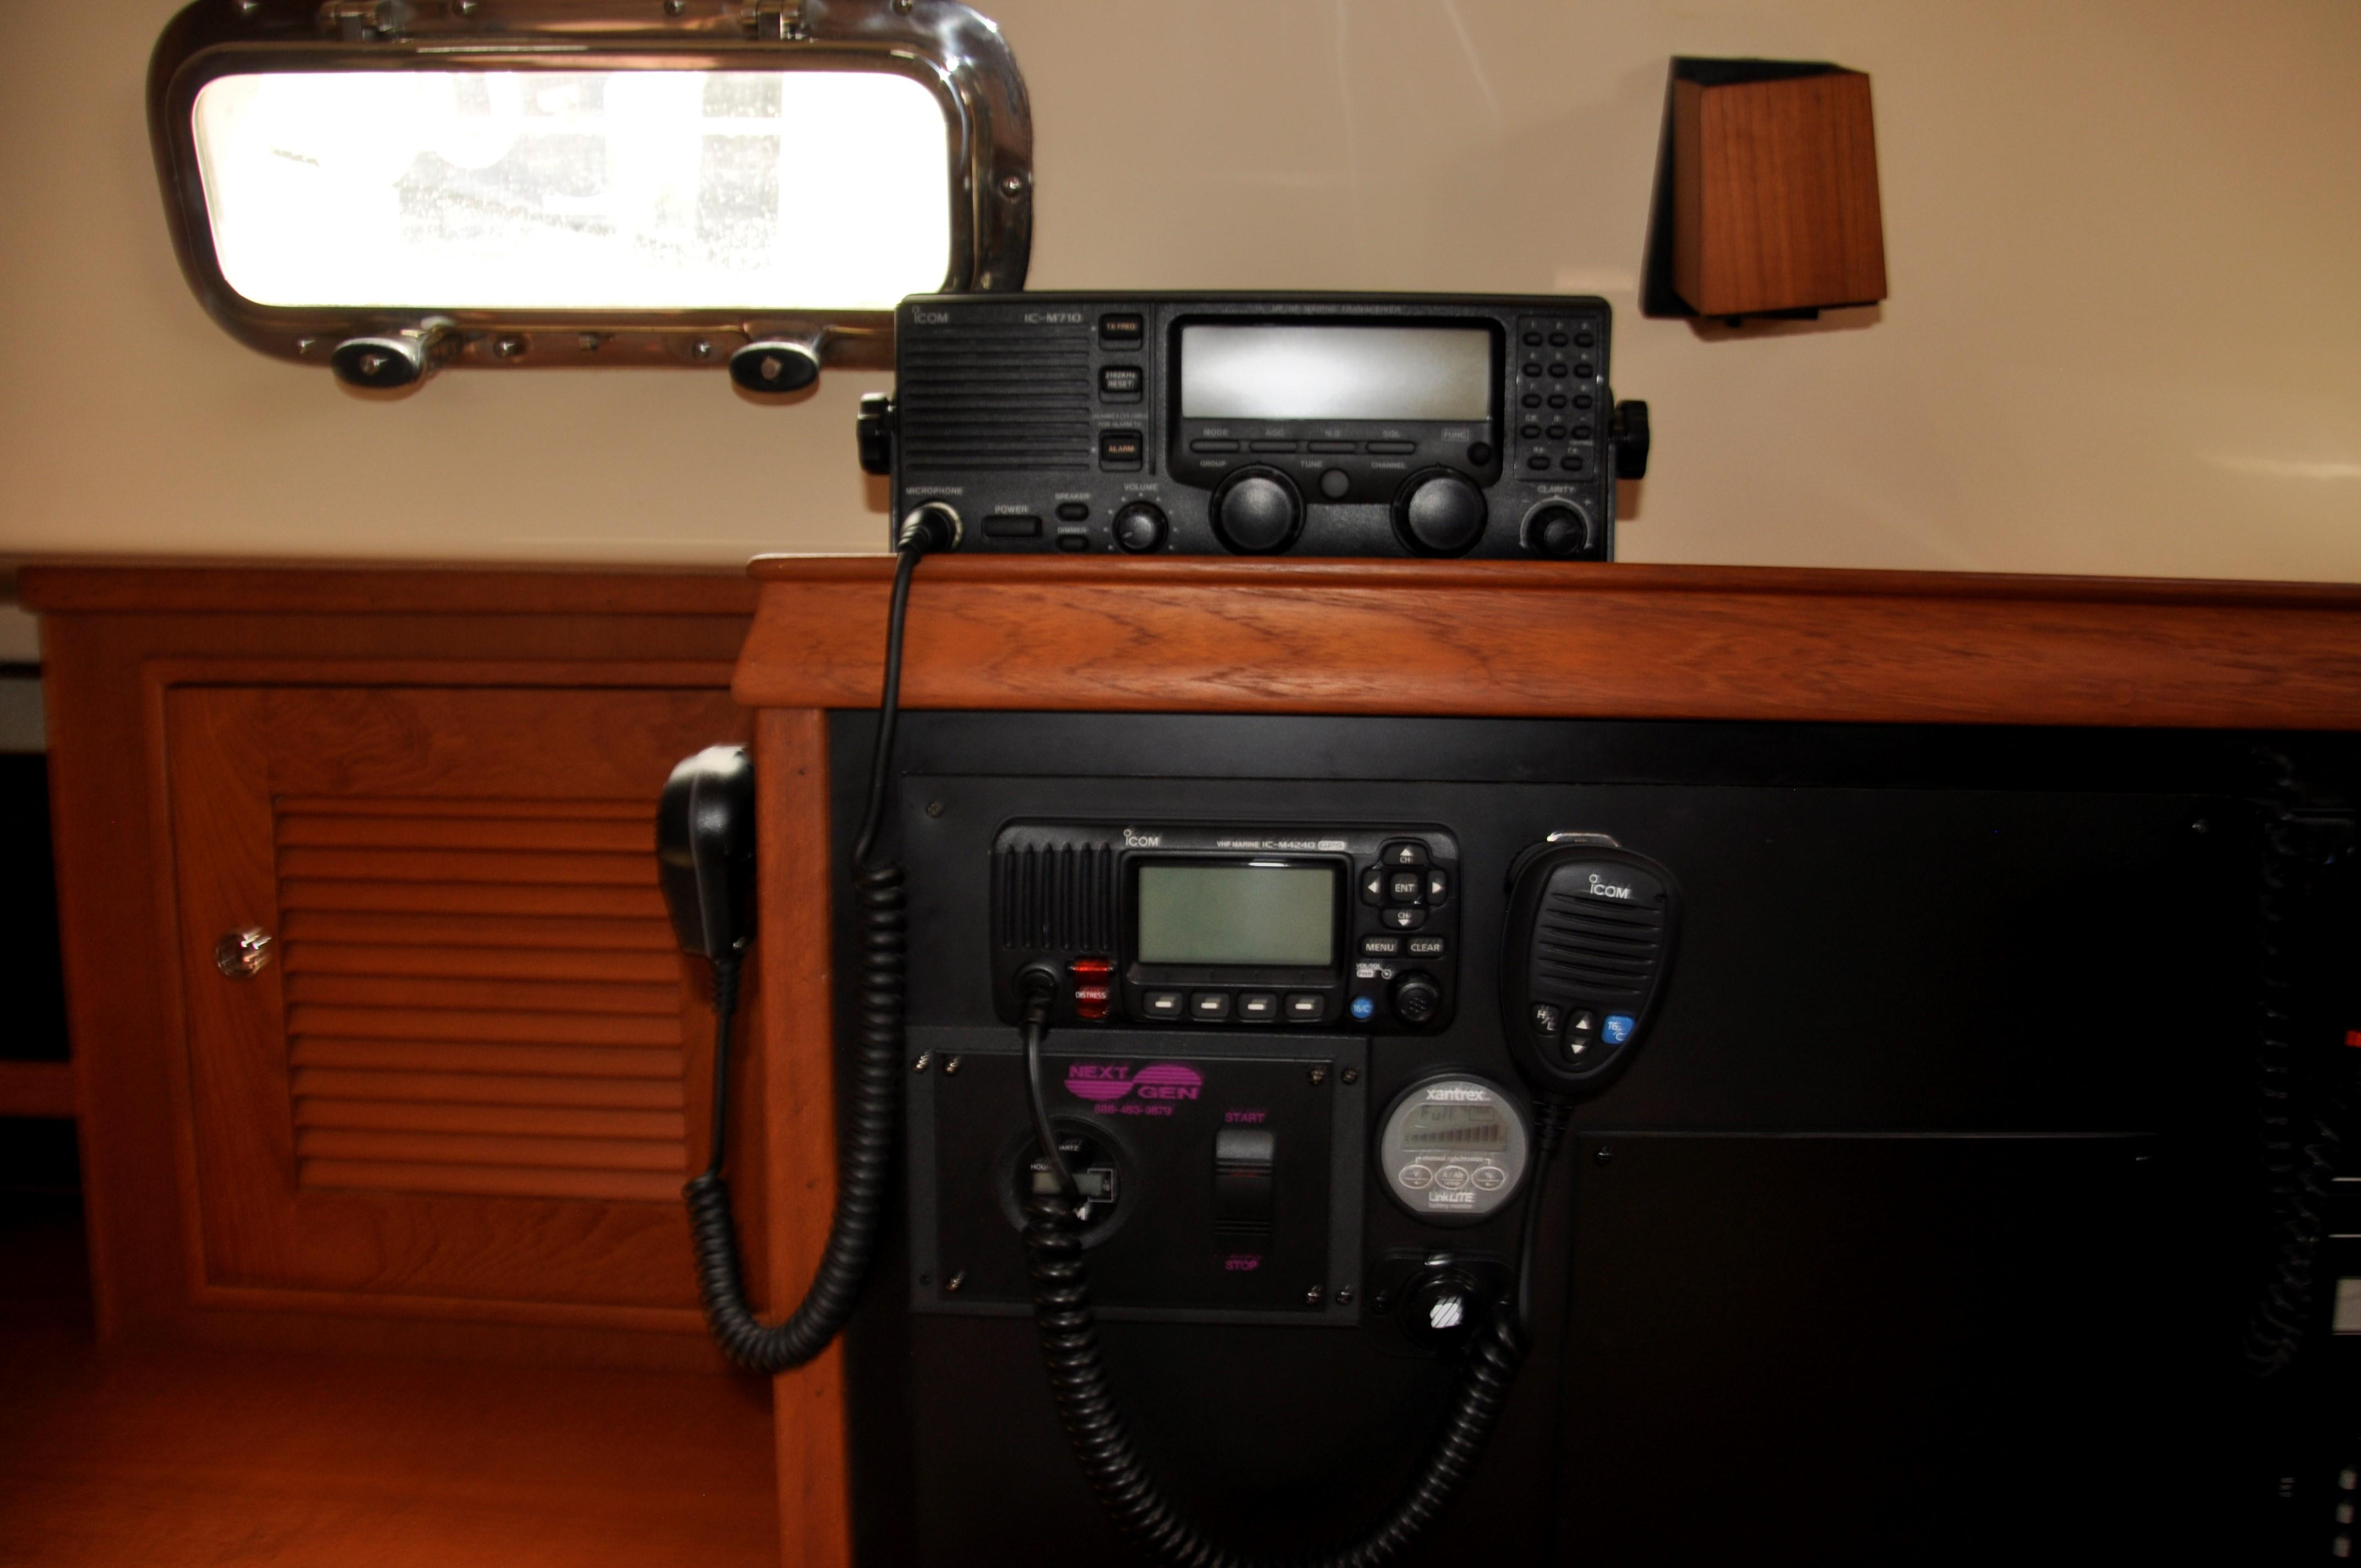 SSB and VHF radios